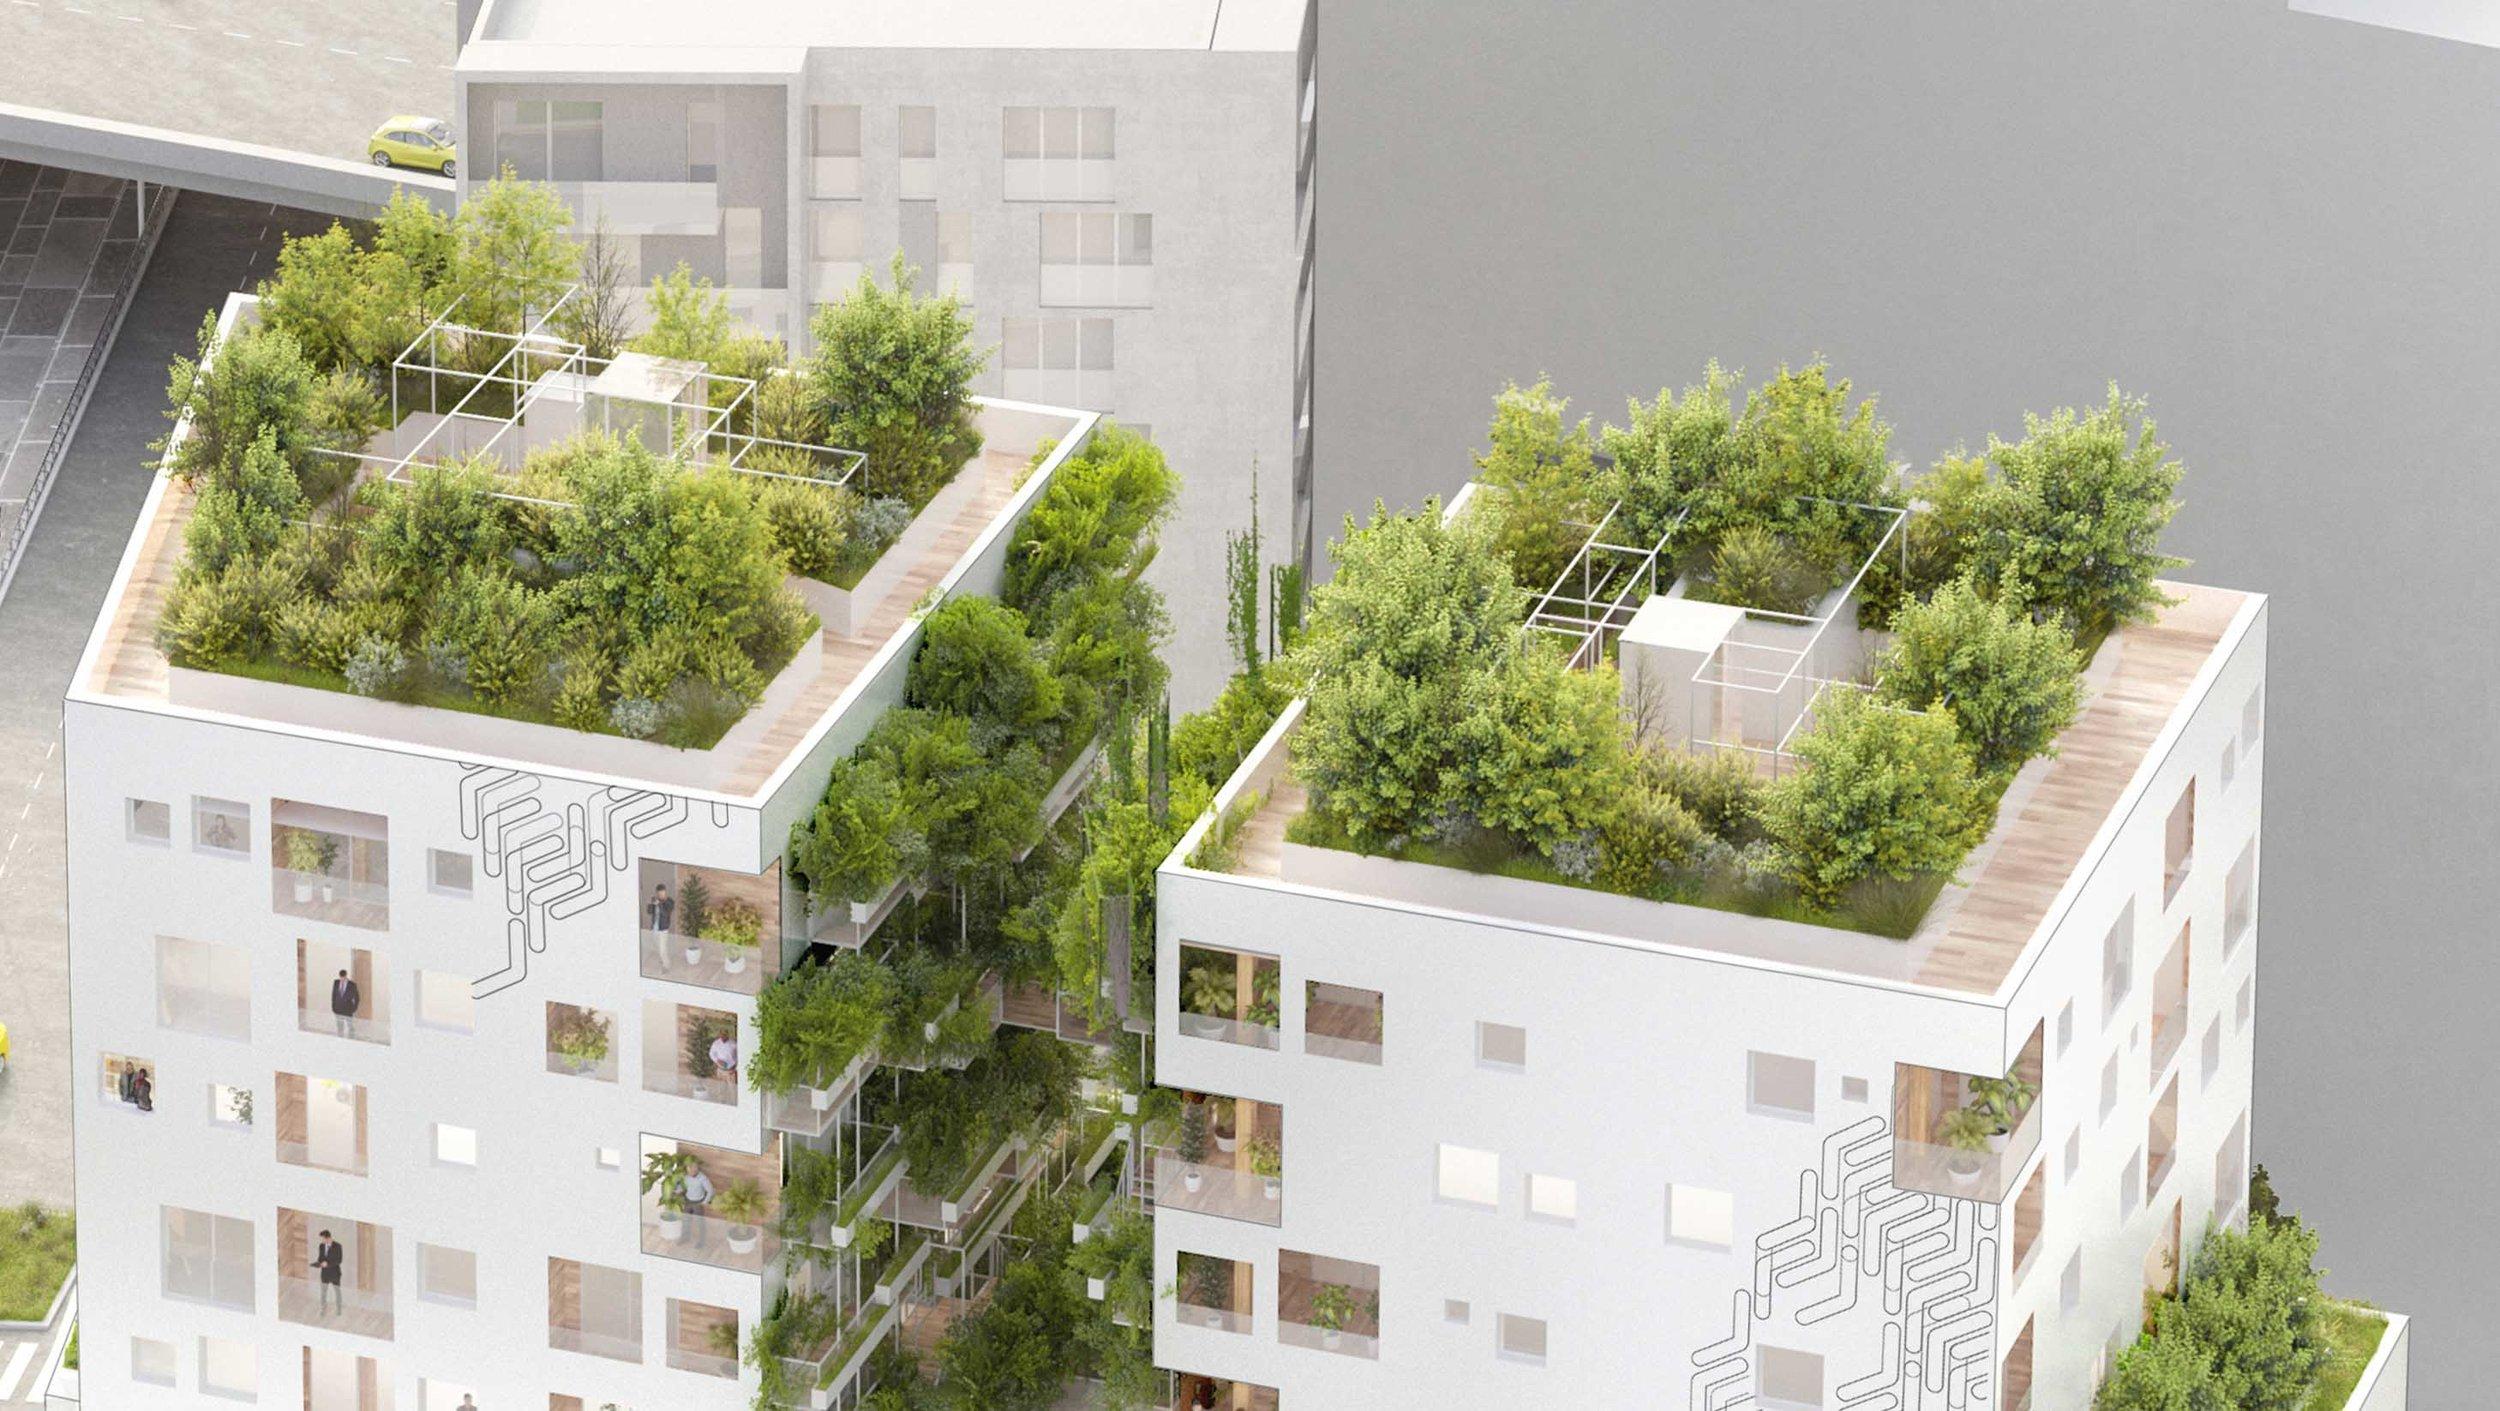 AR architectes Studio d'architectures Art & Build lan kaufman borad B1A3 semapa bruneseau massena (19).jpg